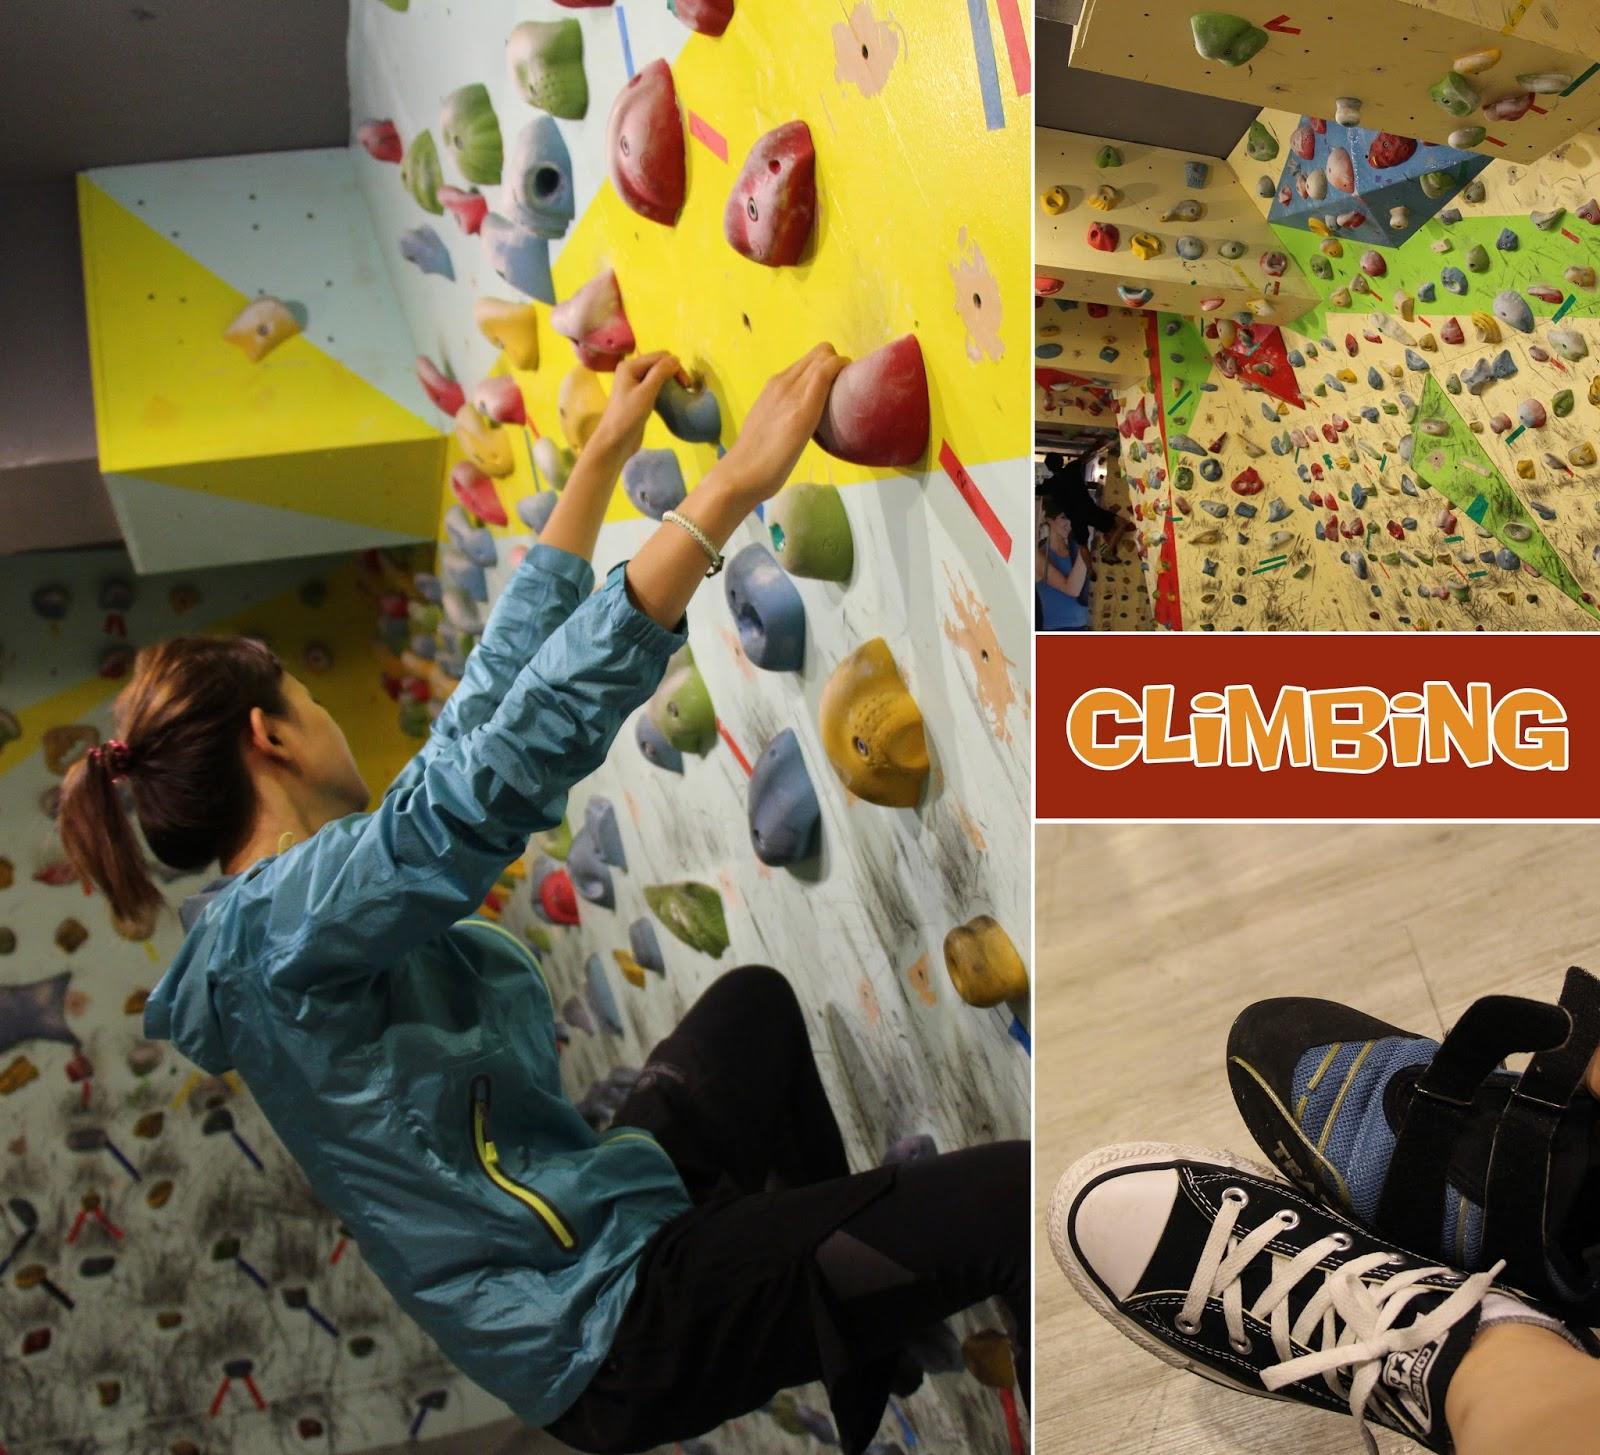 http://www.zoyaslookbook.com/2014/09/climbing.html